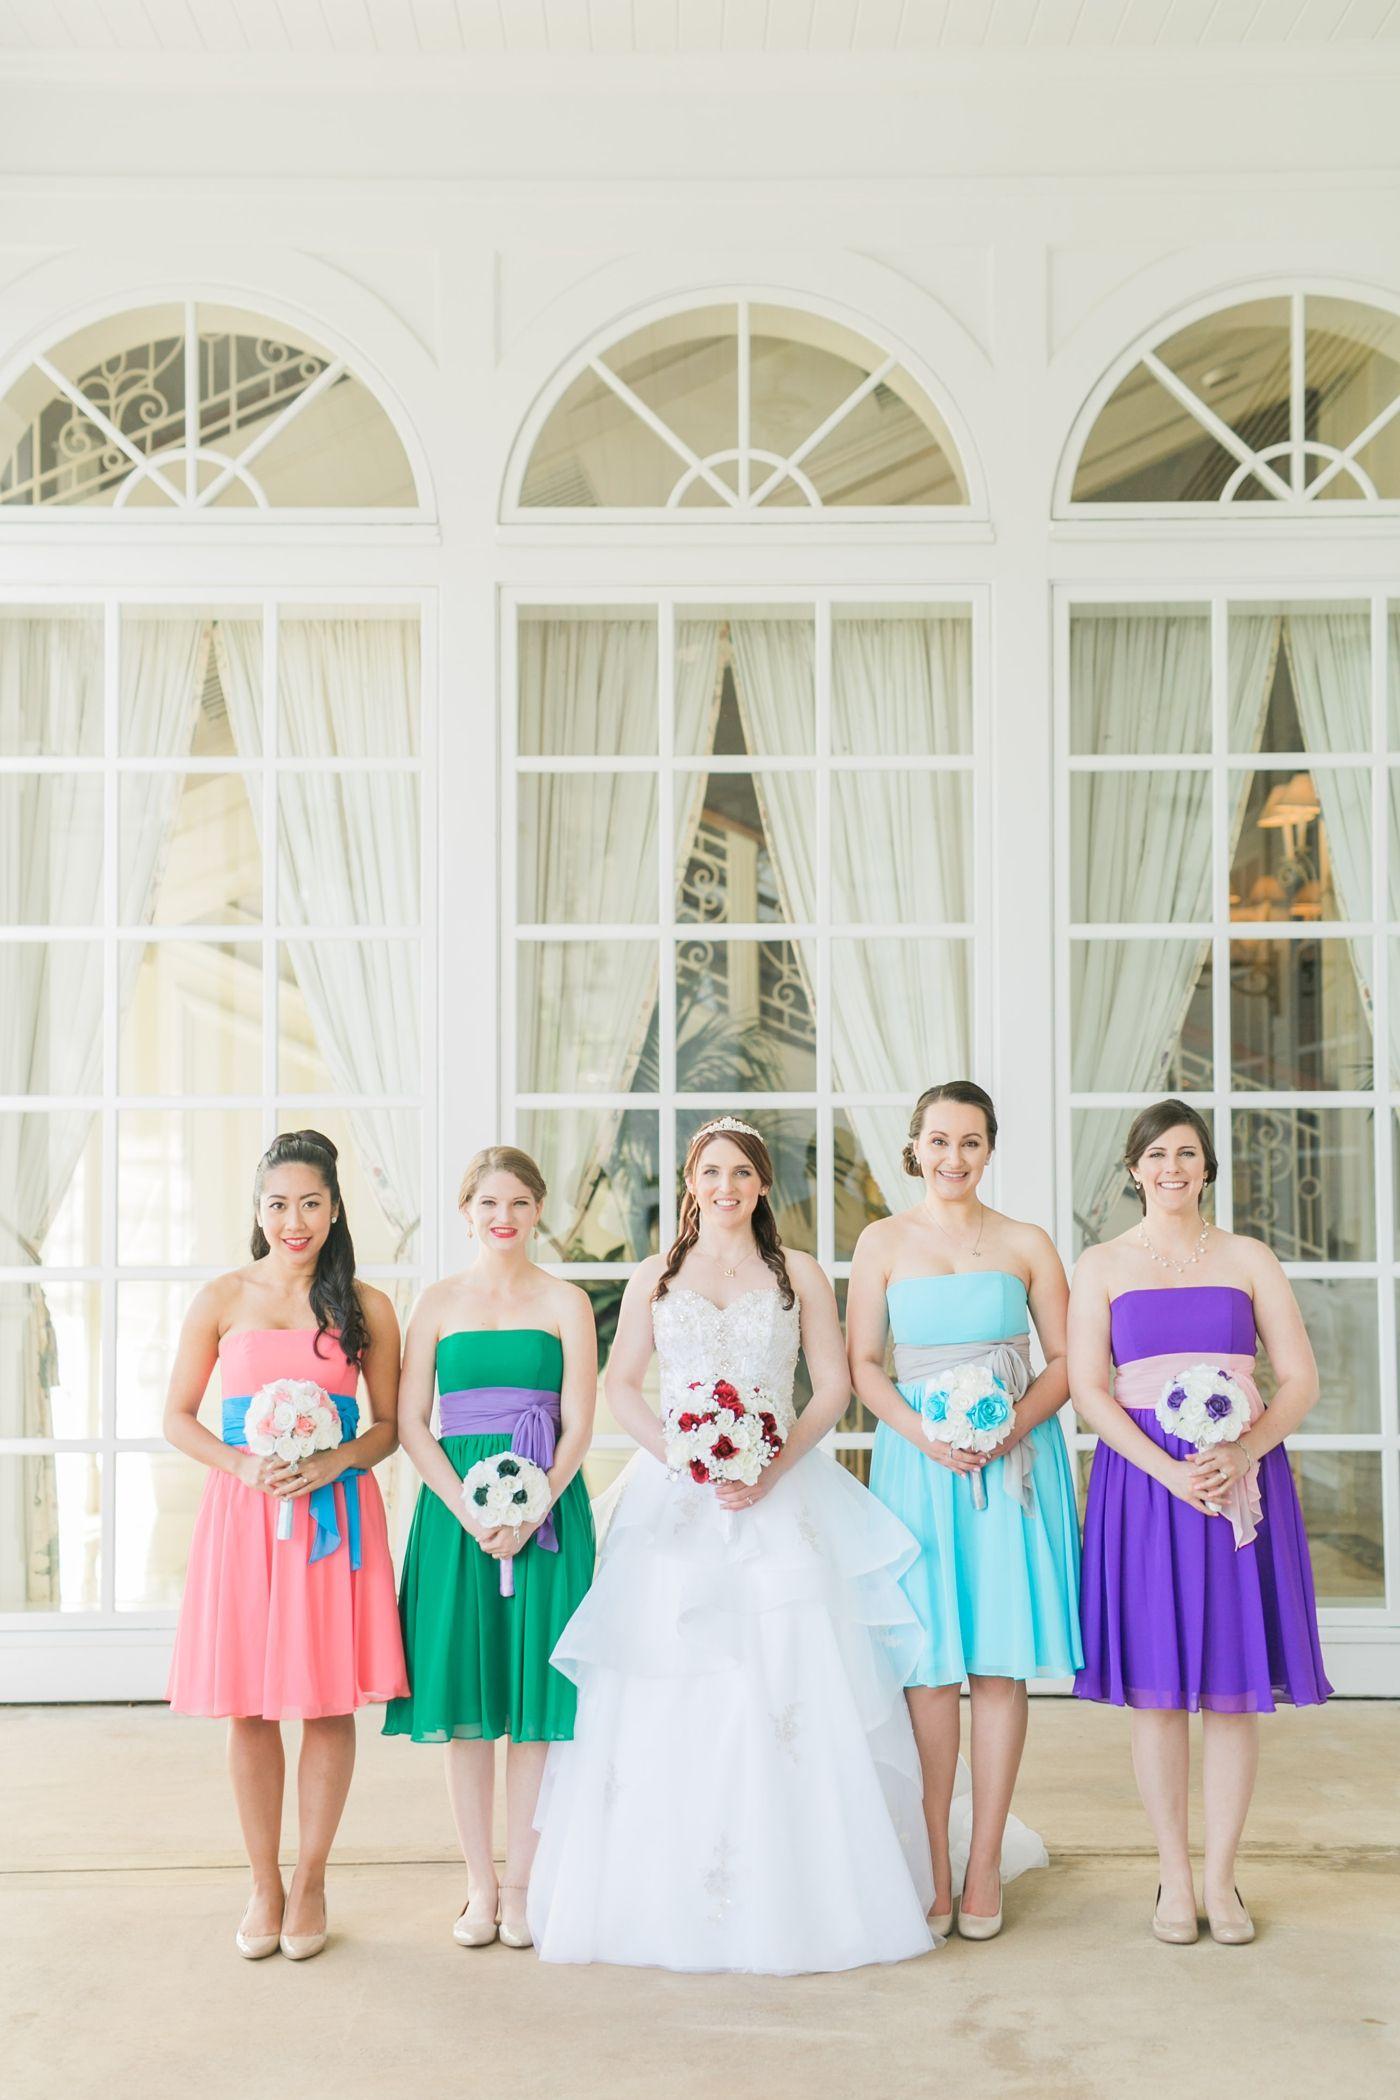 Tangled themed wedding at Disney World | Pinterest | Tangled, Disney ...